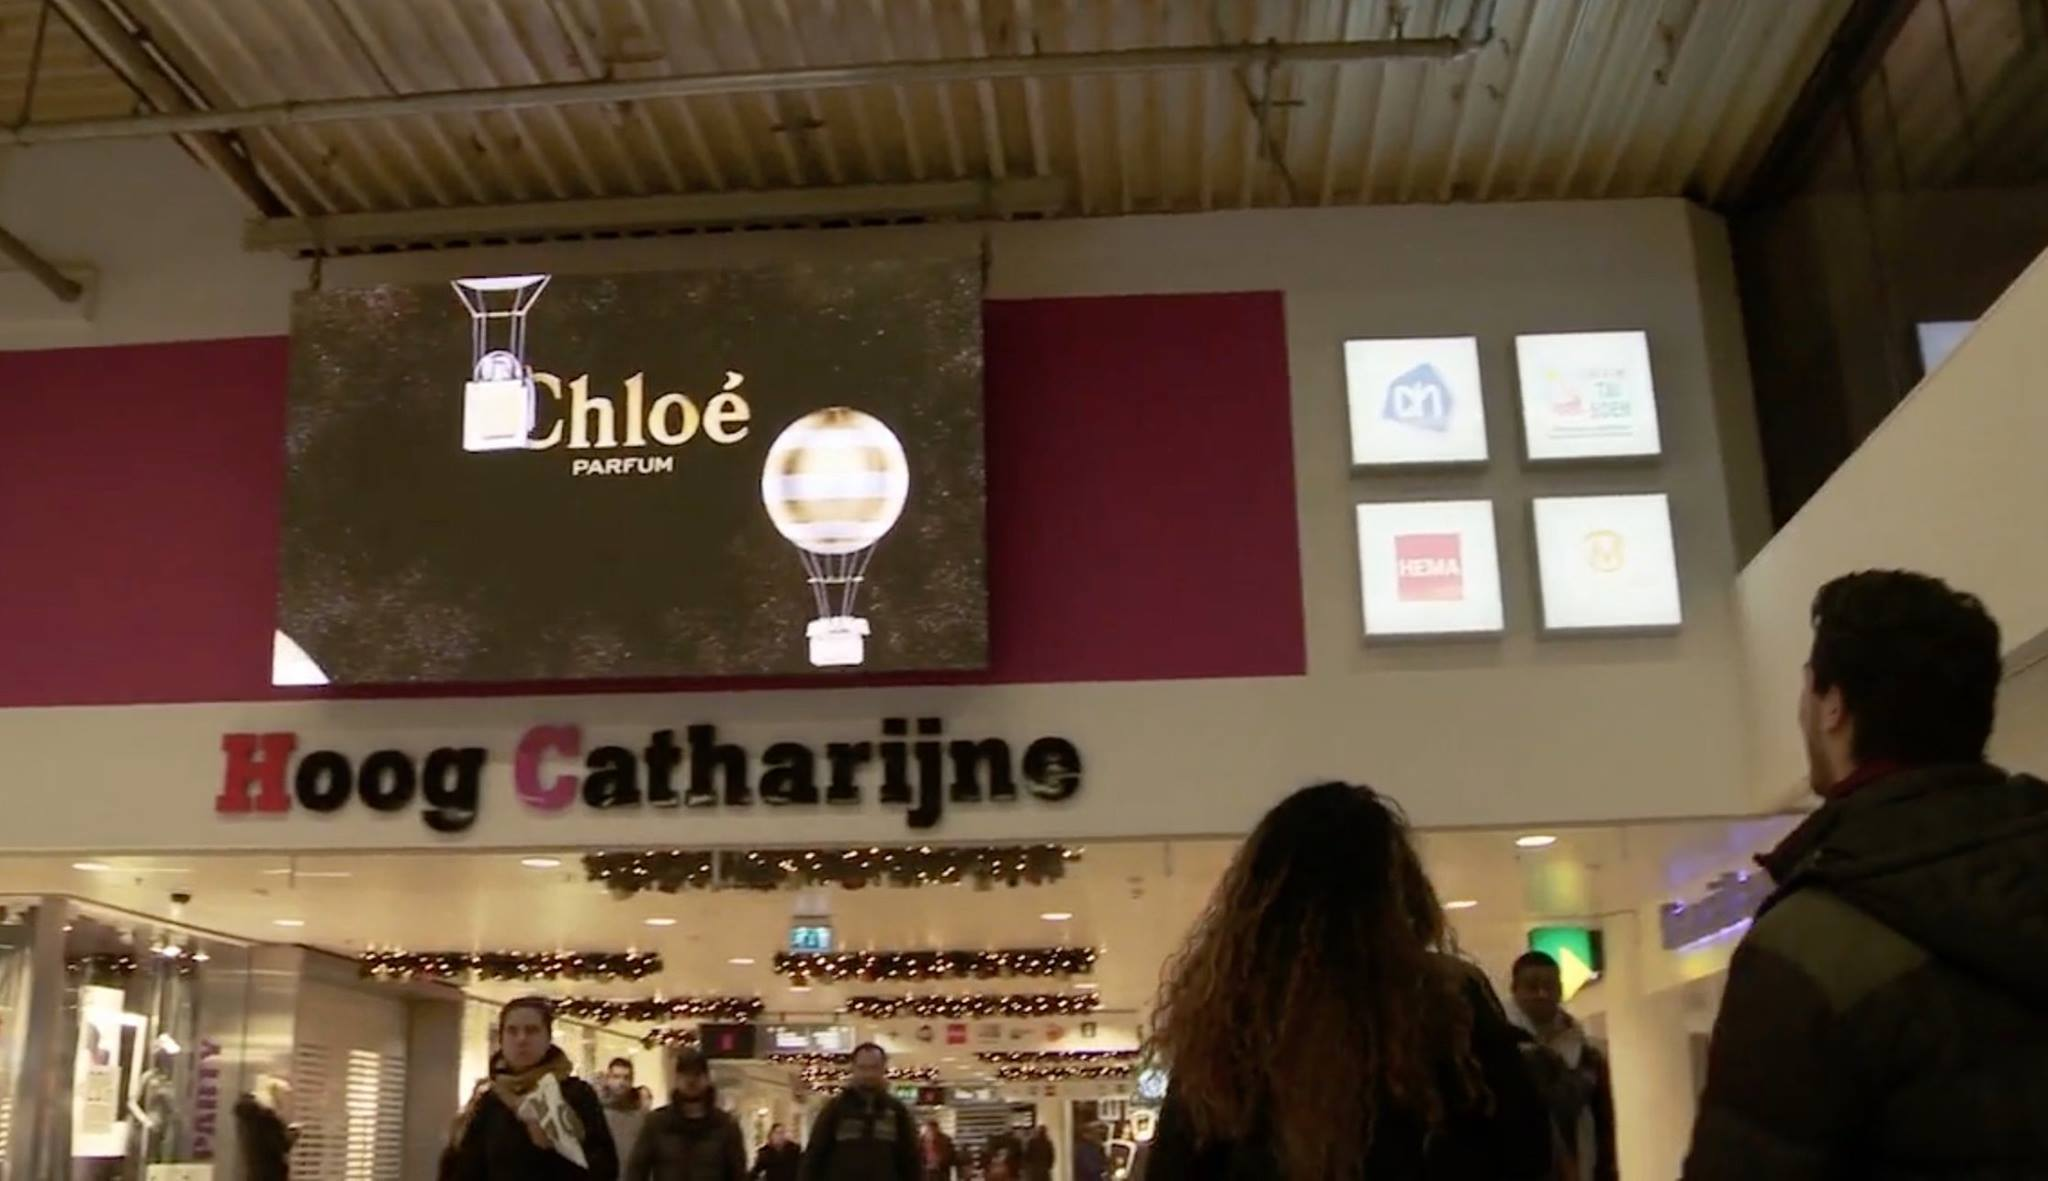 Hoog Catharijne LED Scherm Display